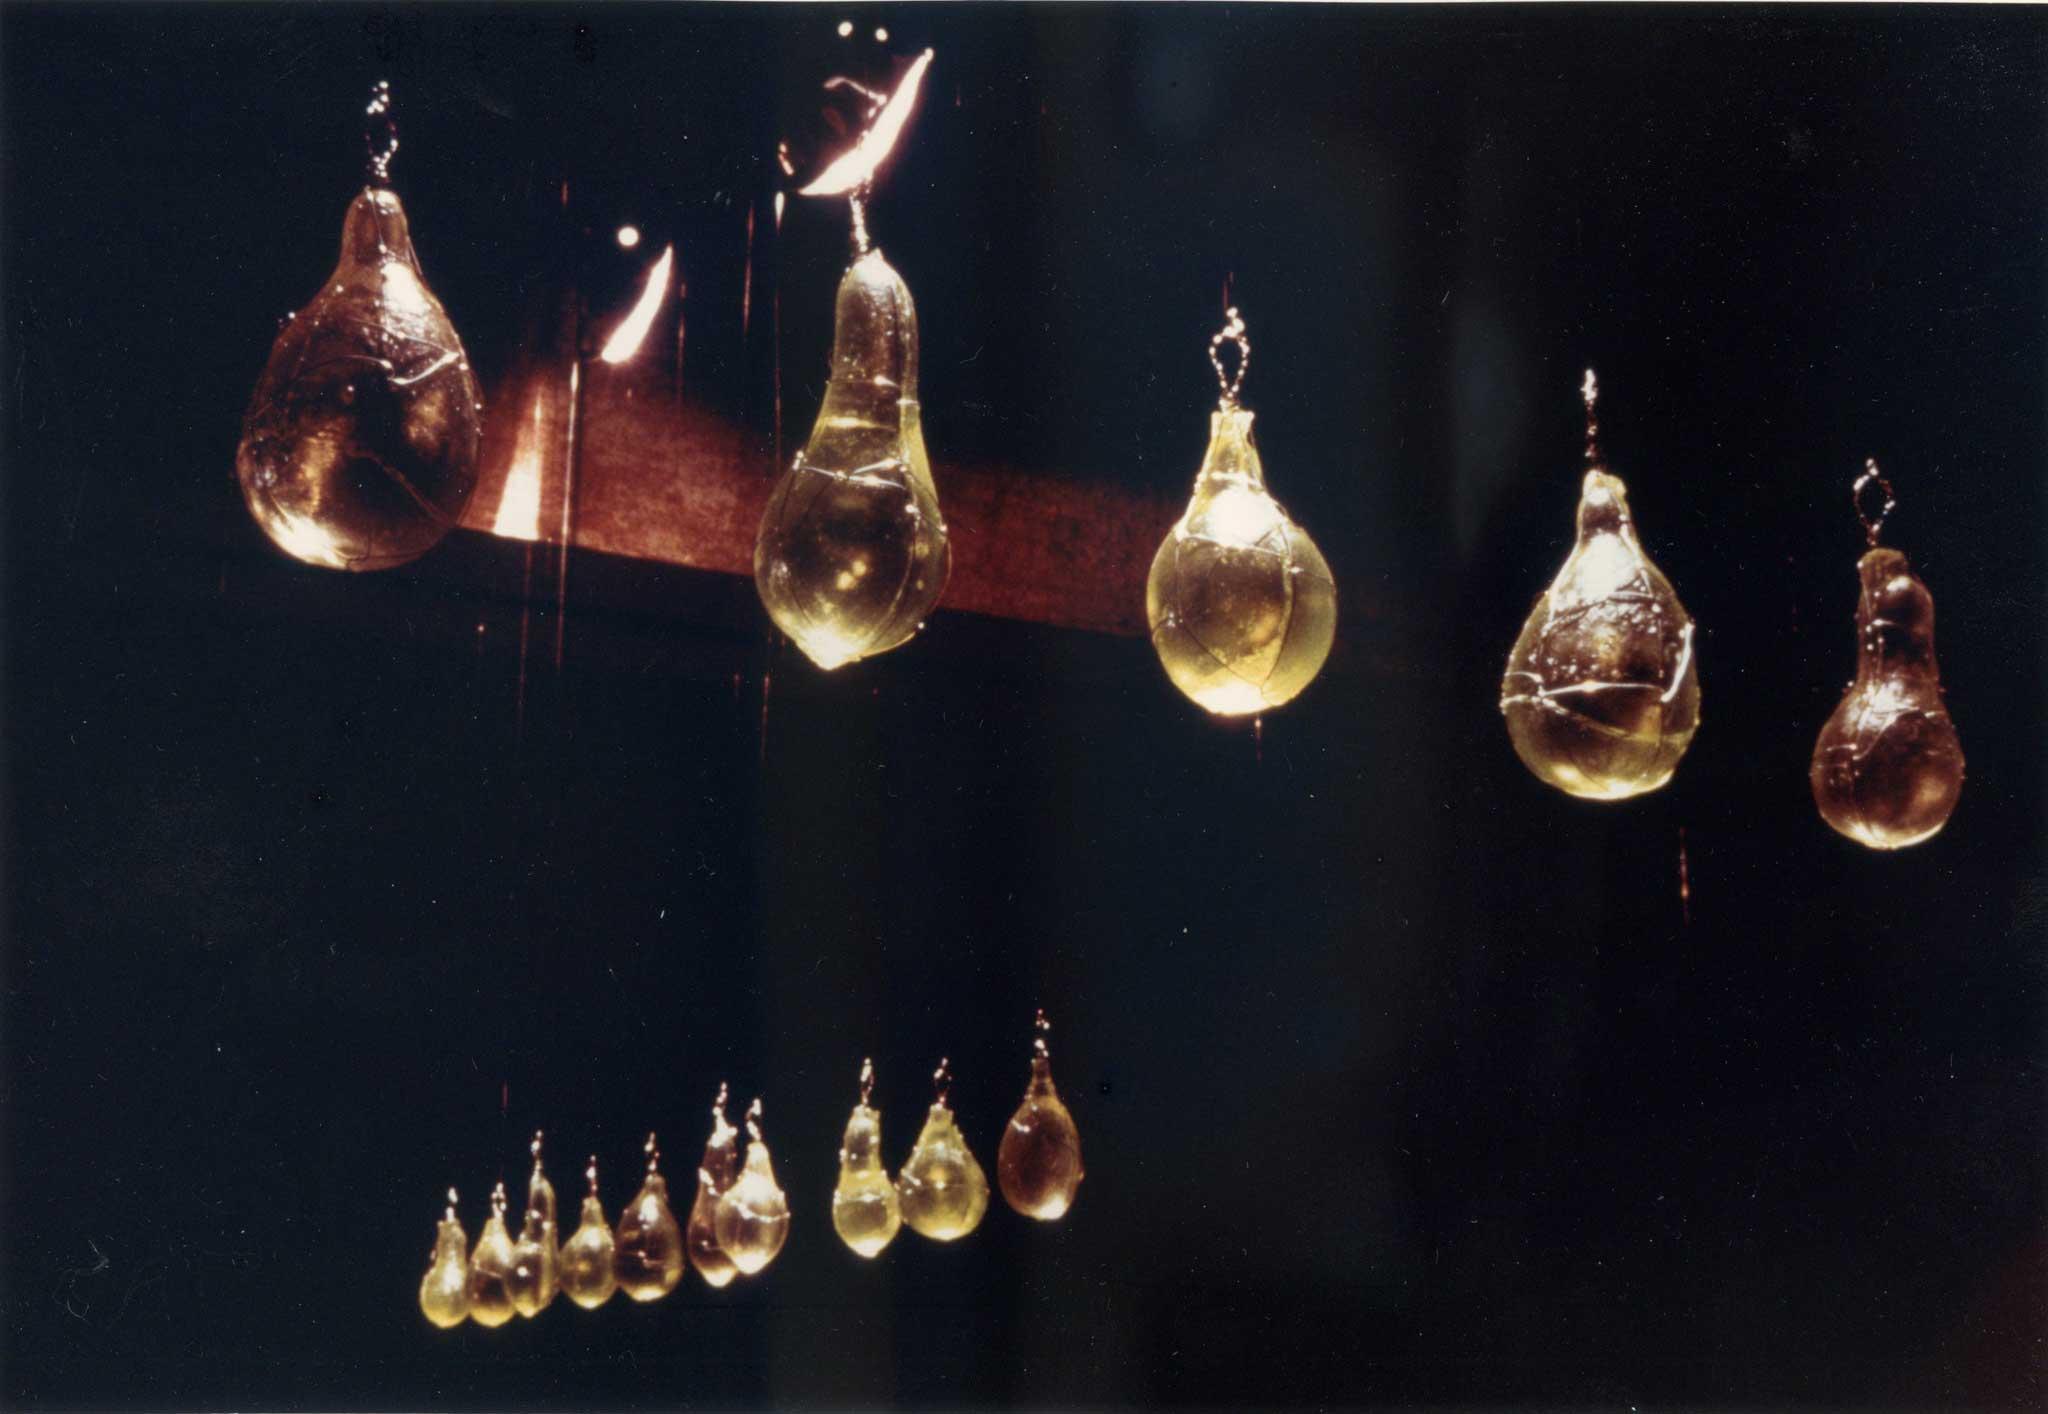 Amy Helfand, Semilla (Detail), 1993 - 18' x 24' x 12' - Plaster, acrylic resin, wire, graphite. | Image courtesy of Amy Helfand.